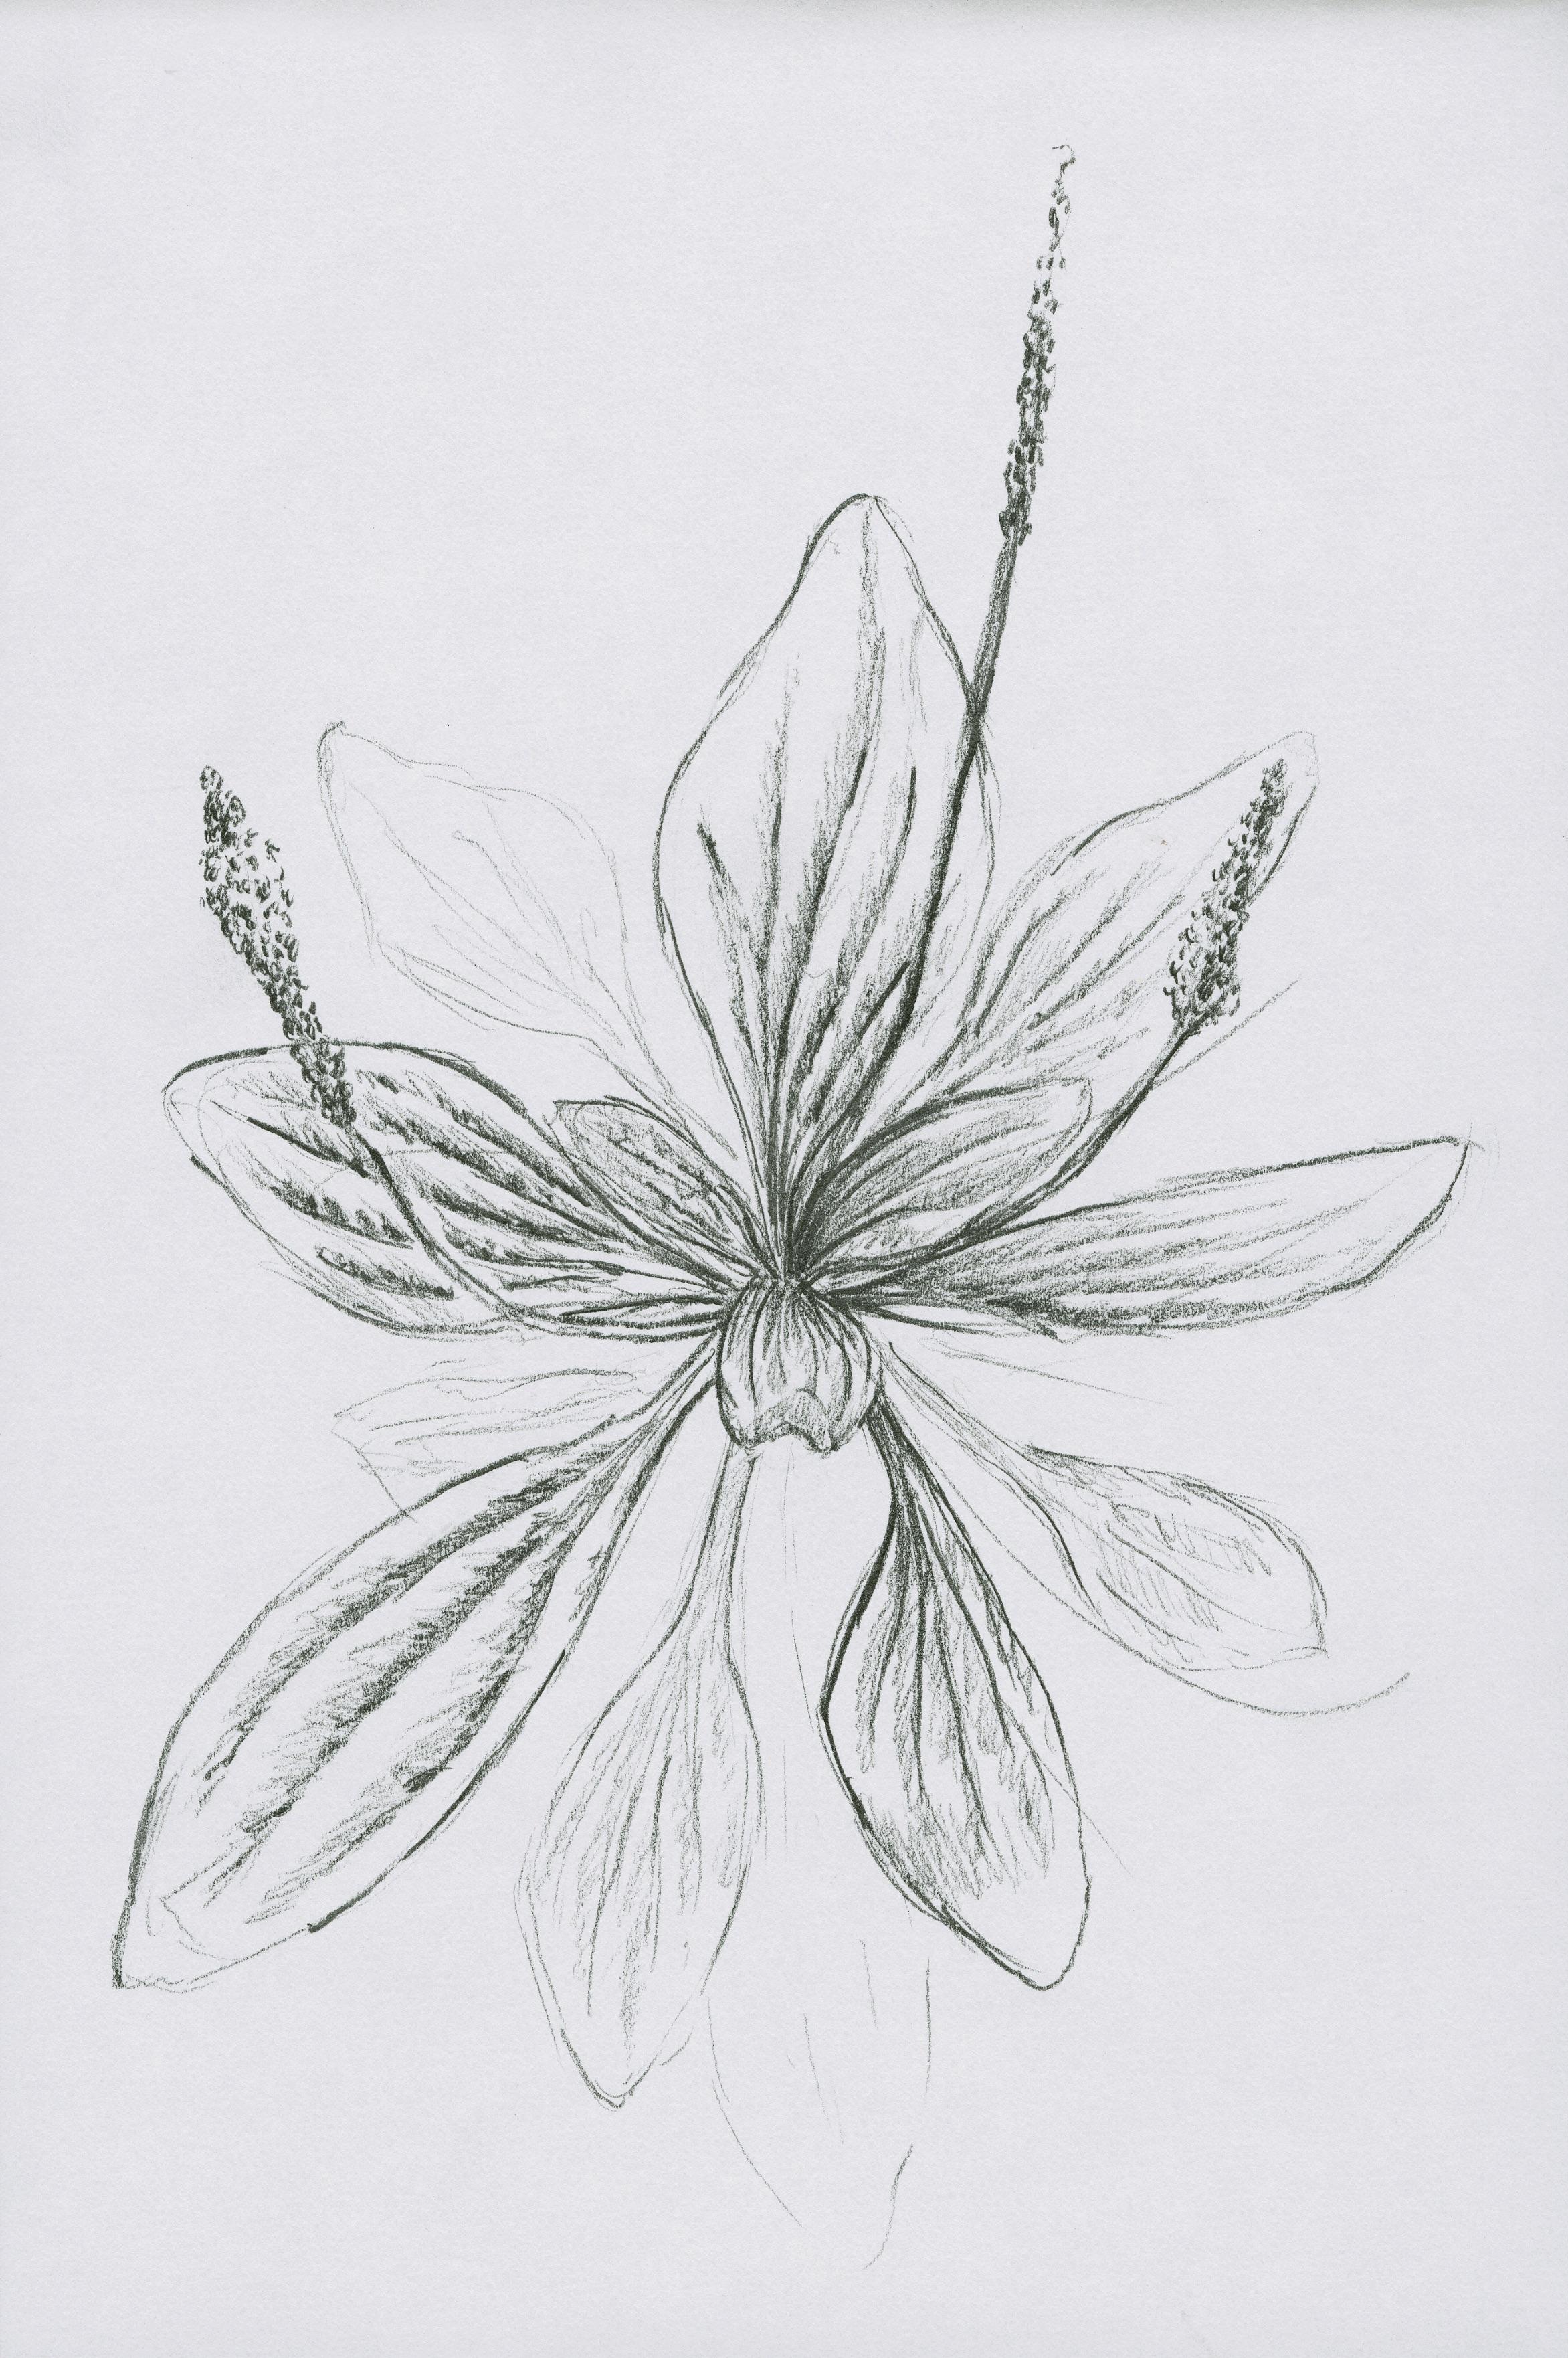 Cheqianzi, drawing by Maria Hicks